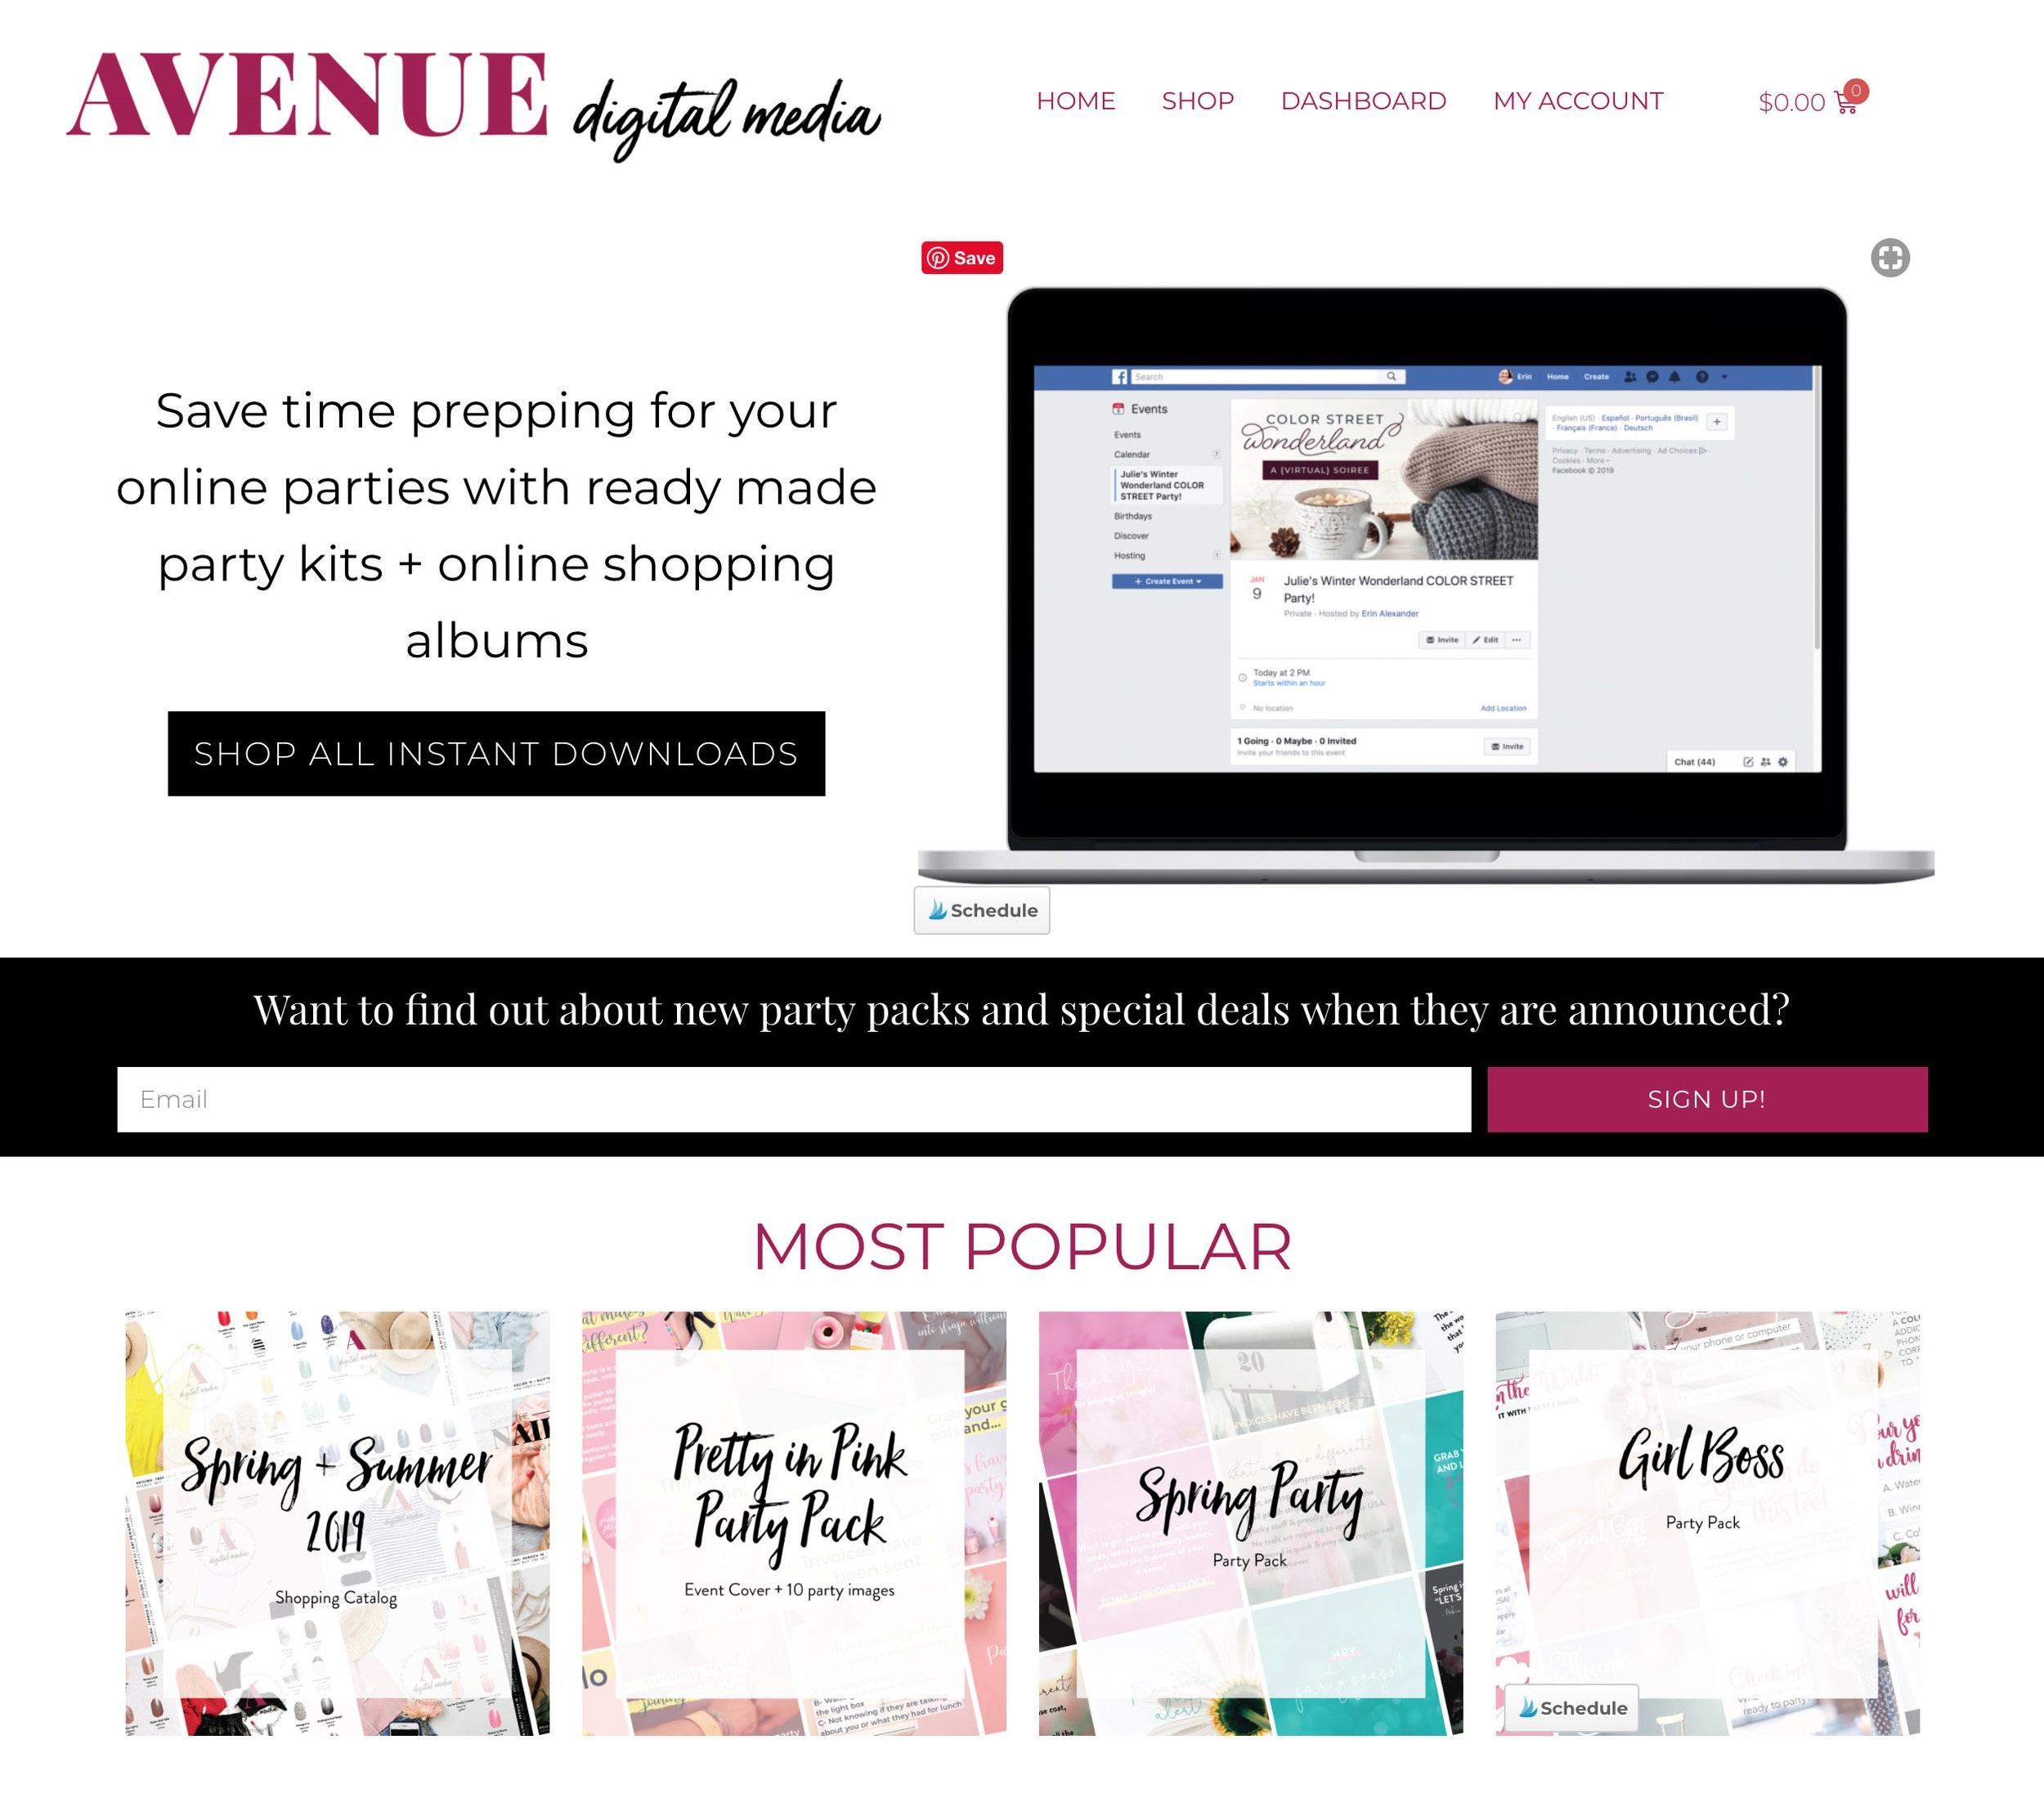 Avenue-Digital-Media-screenshot-a-custom-Wordpress-design-by-Alexander-Design-Co.jpg